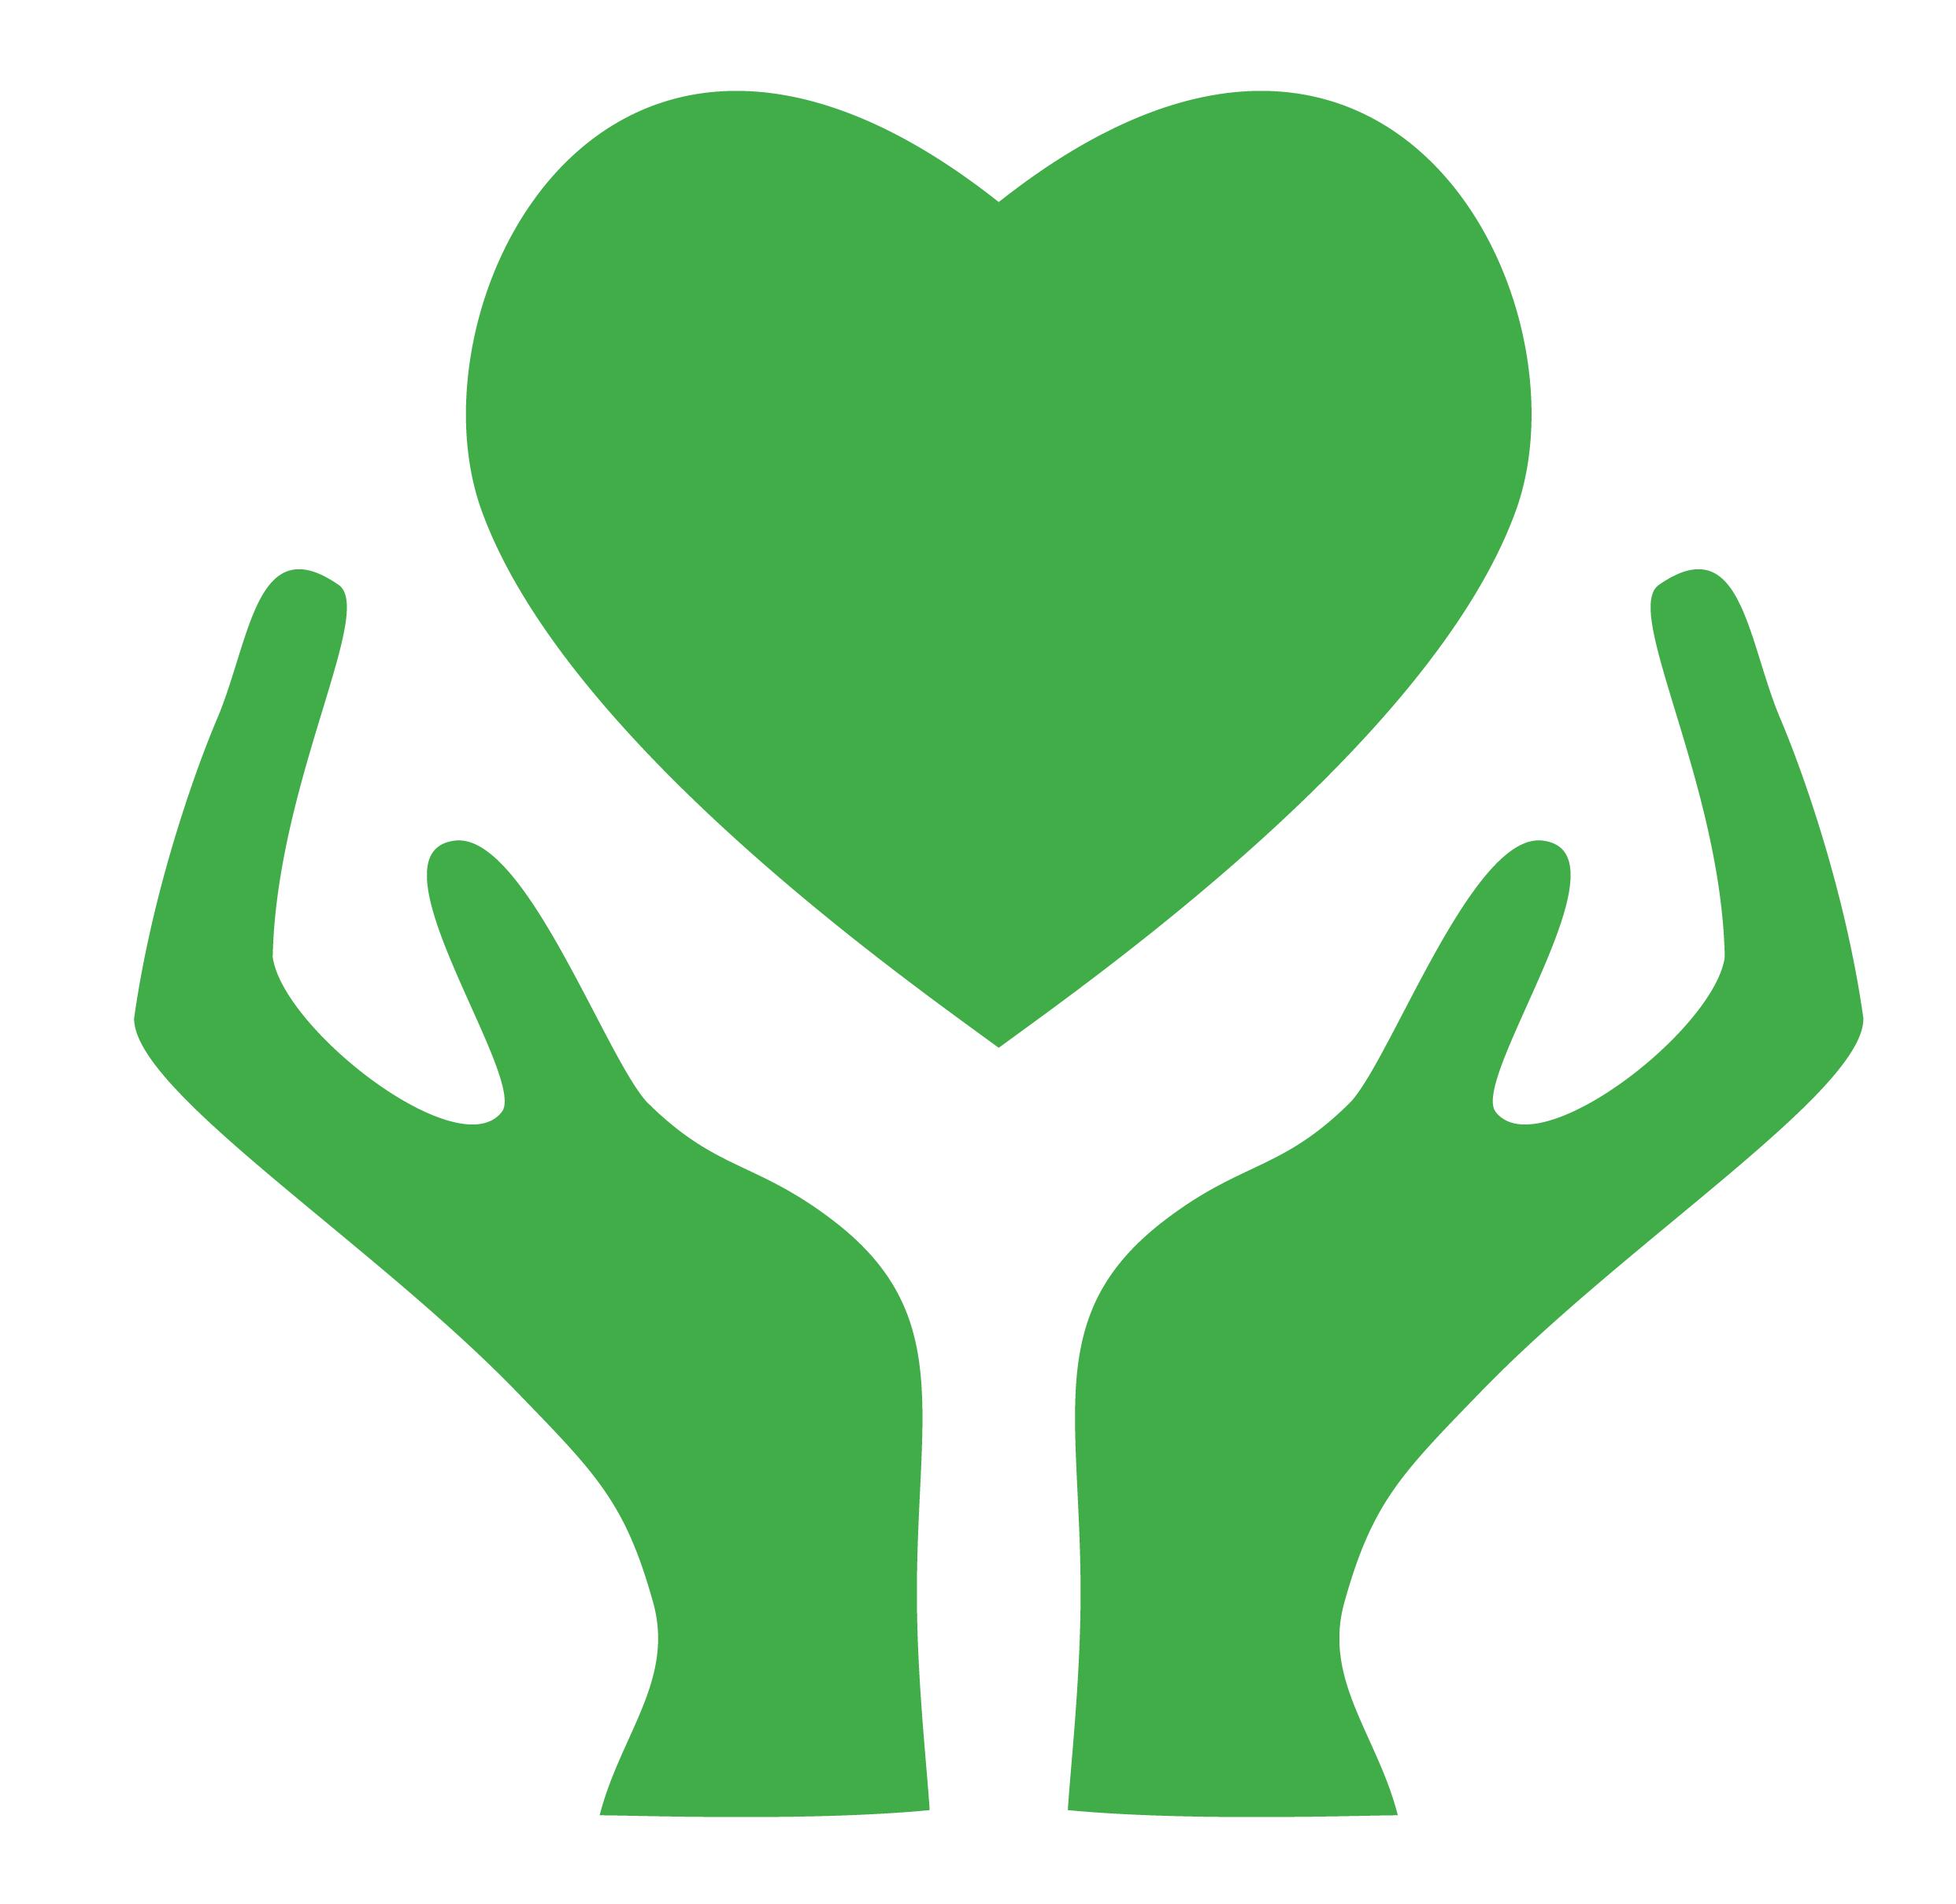 Volunteer Non-Profit Organizations